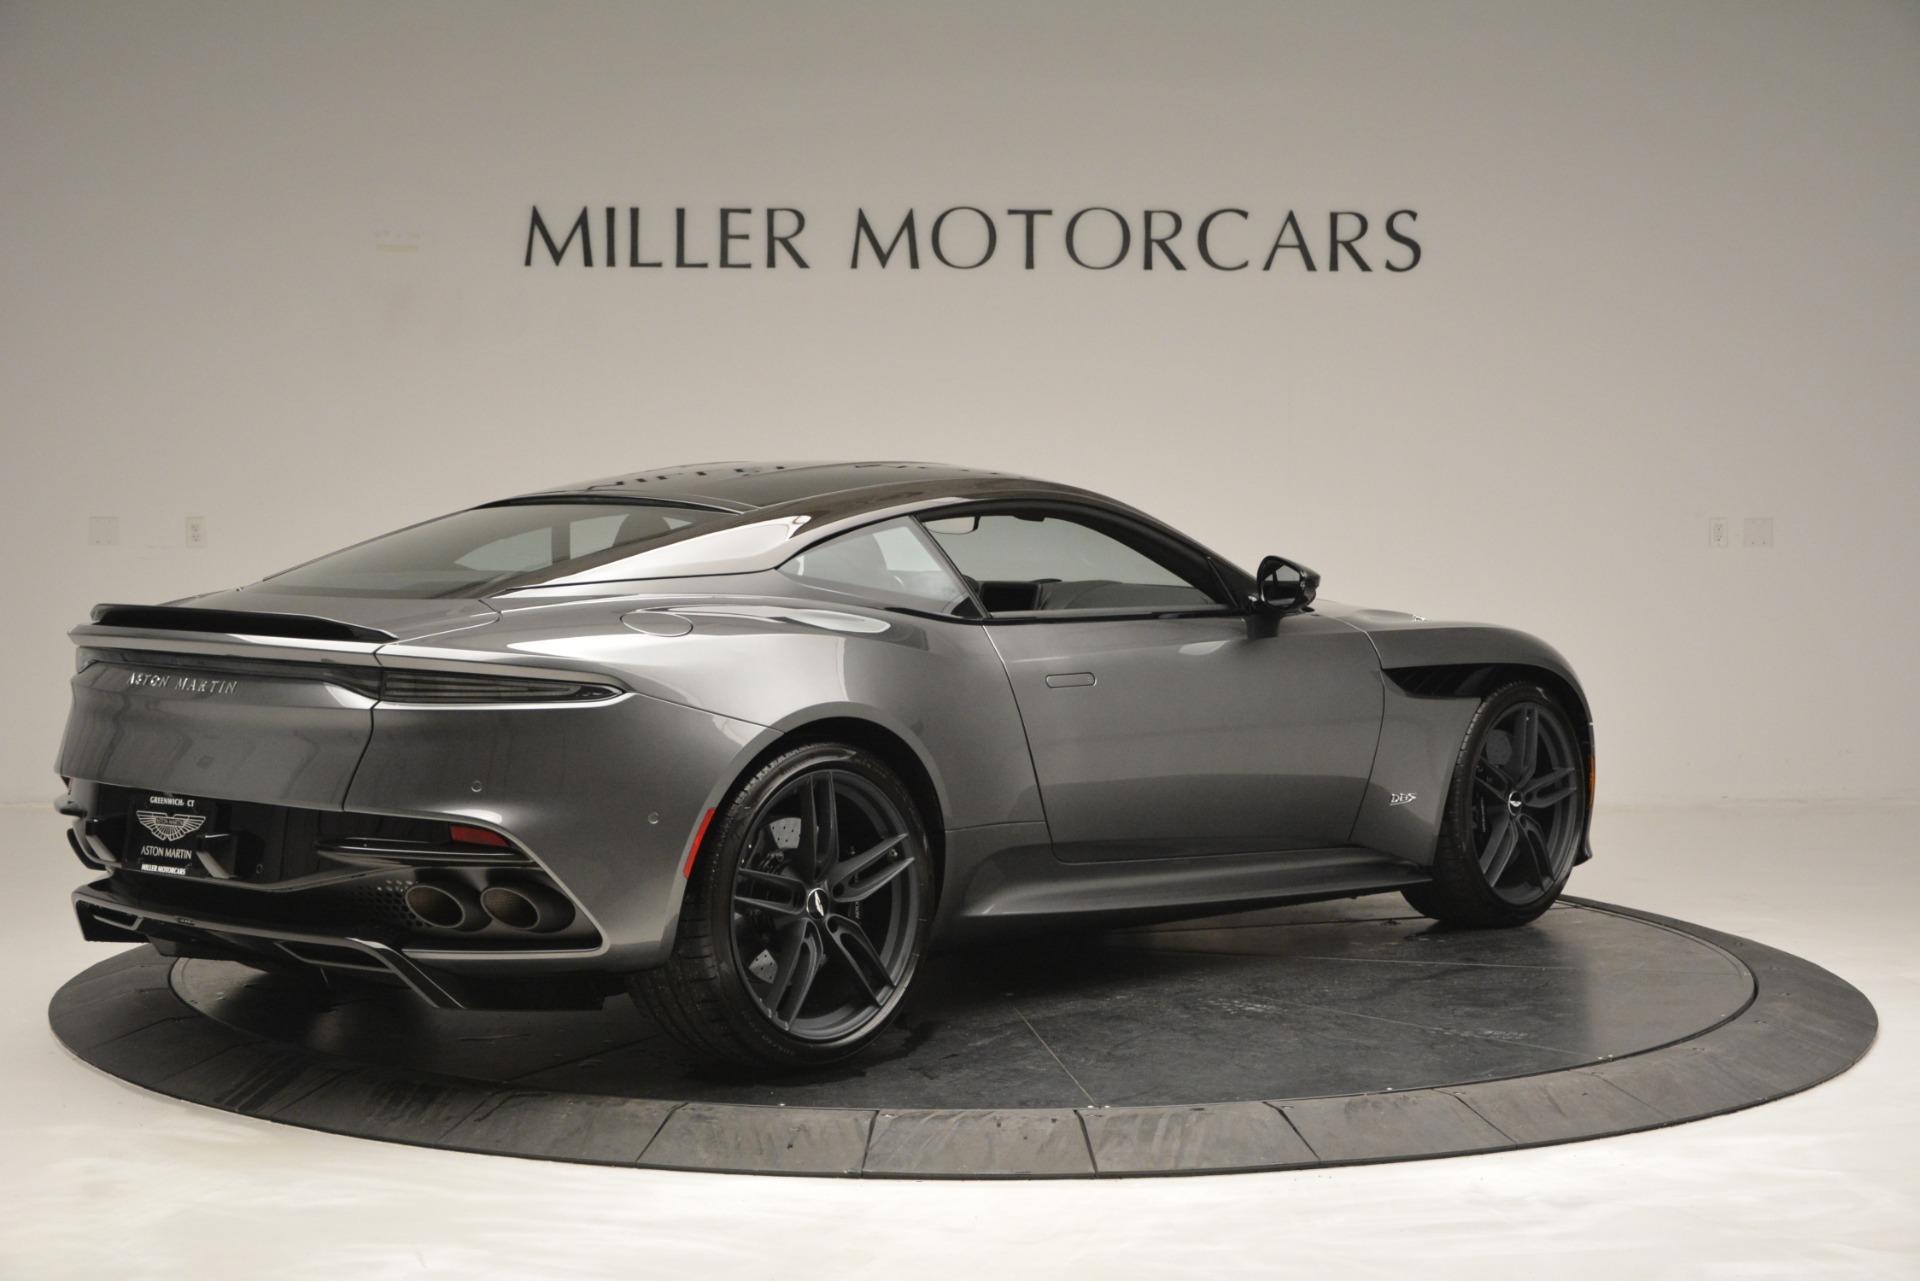 Used 2019 Aston Martin DBS Superleggera Coupe For Sale In Greenwich, CT 2917_p8